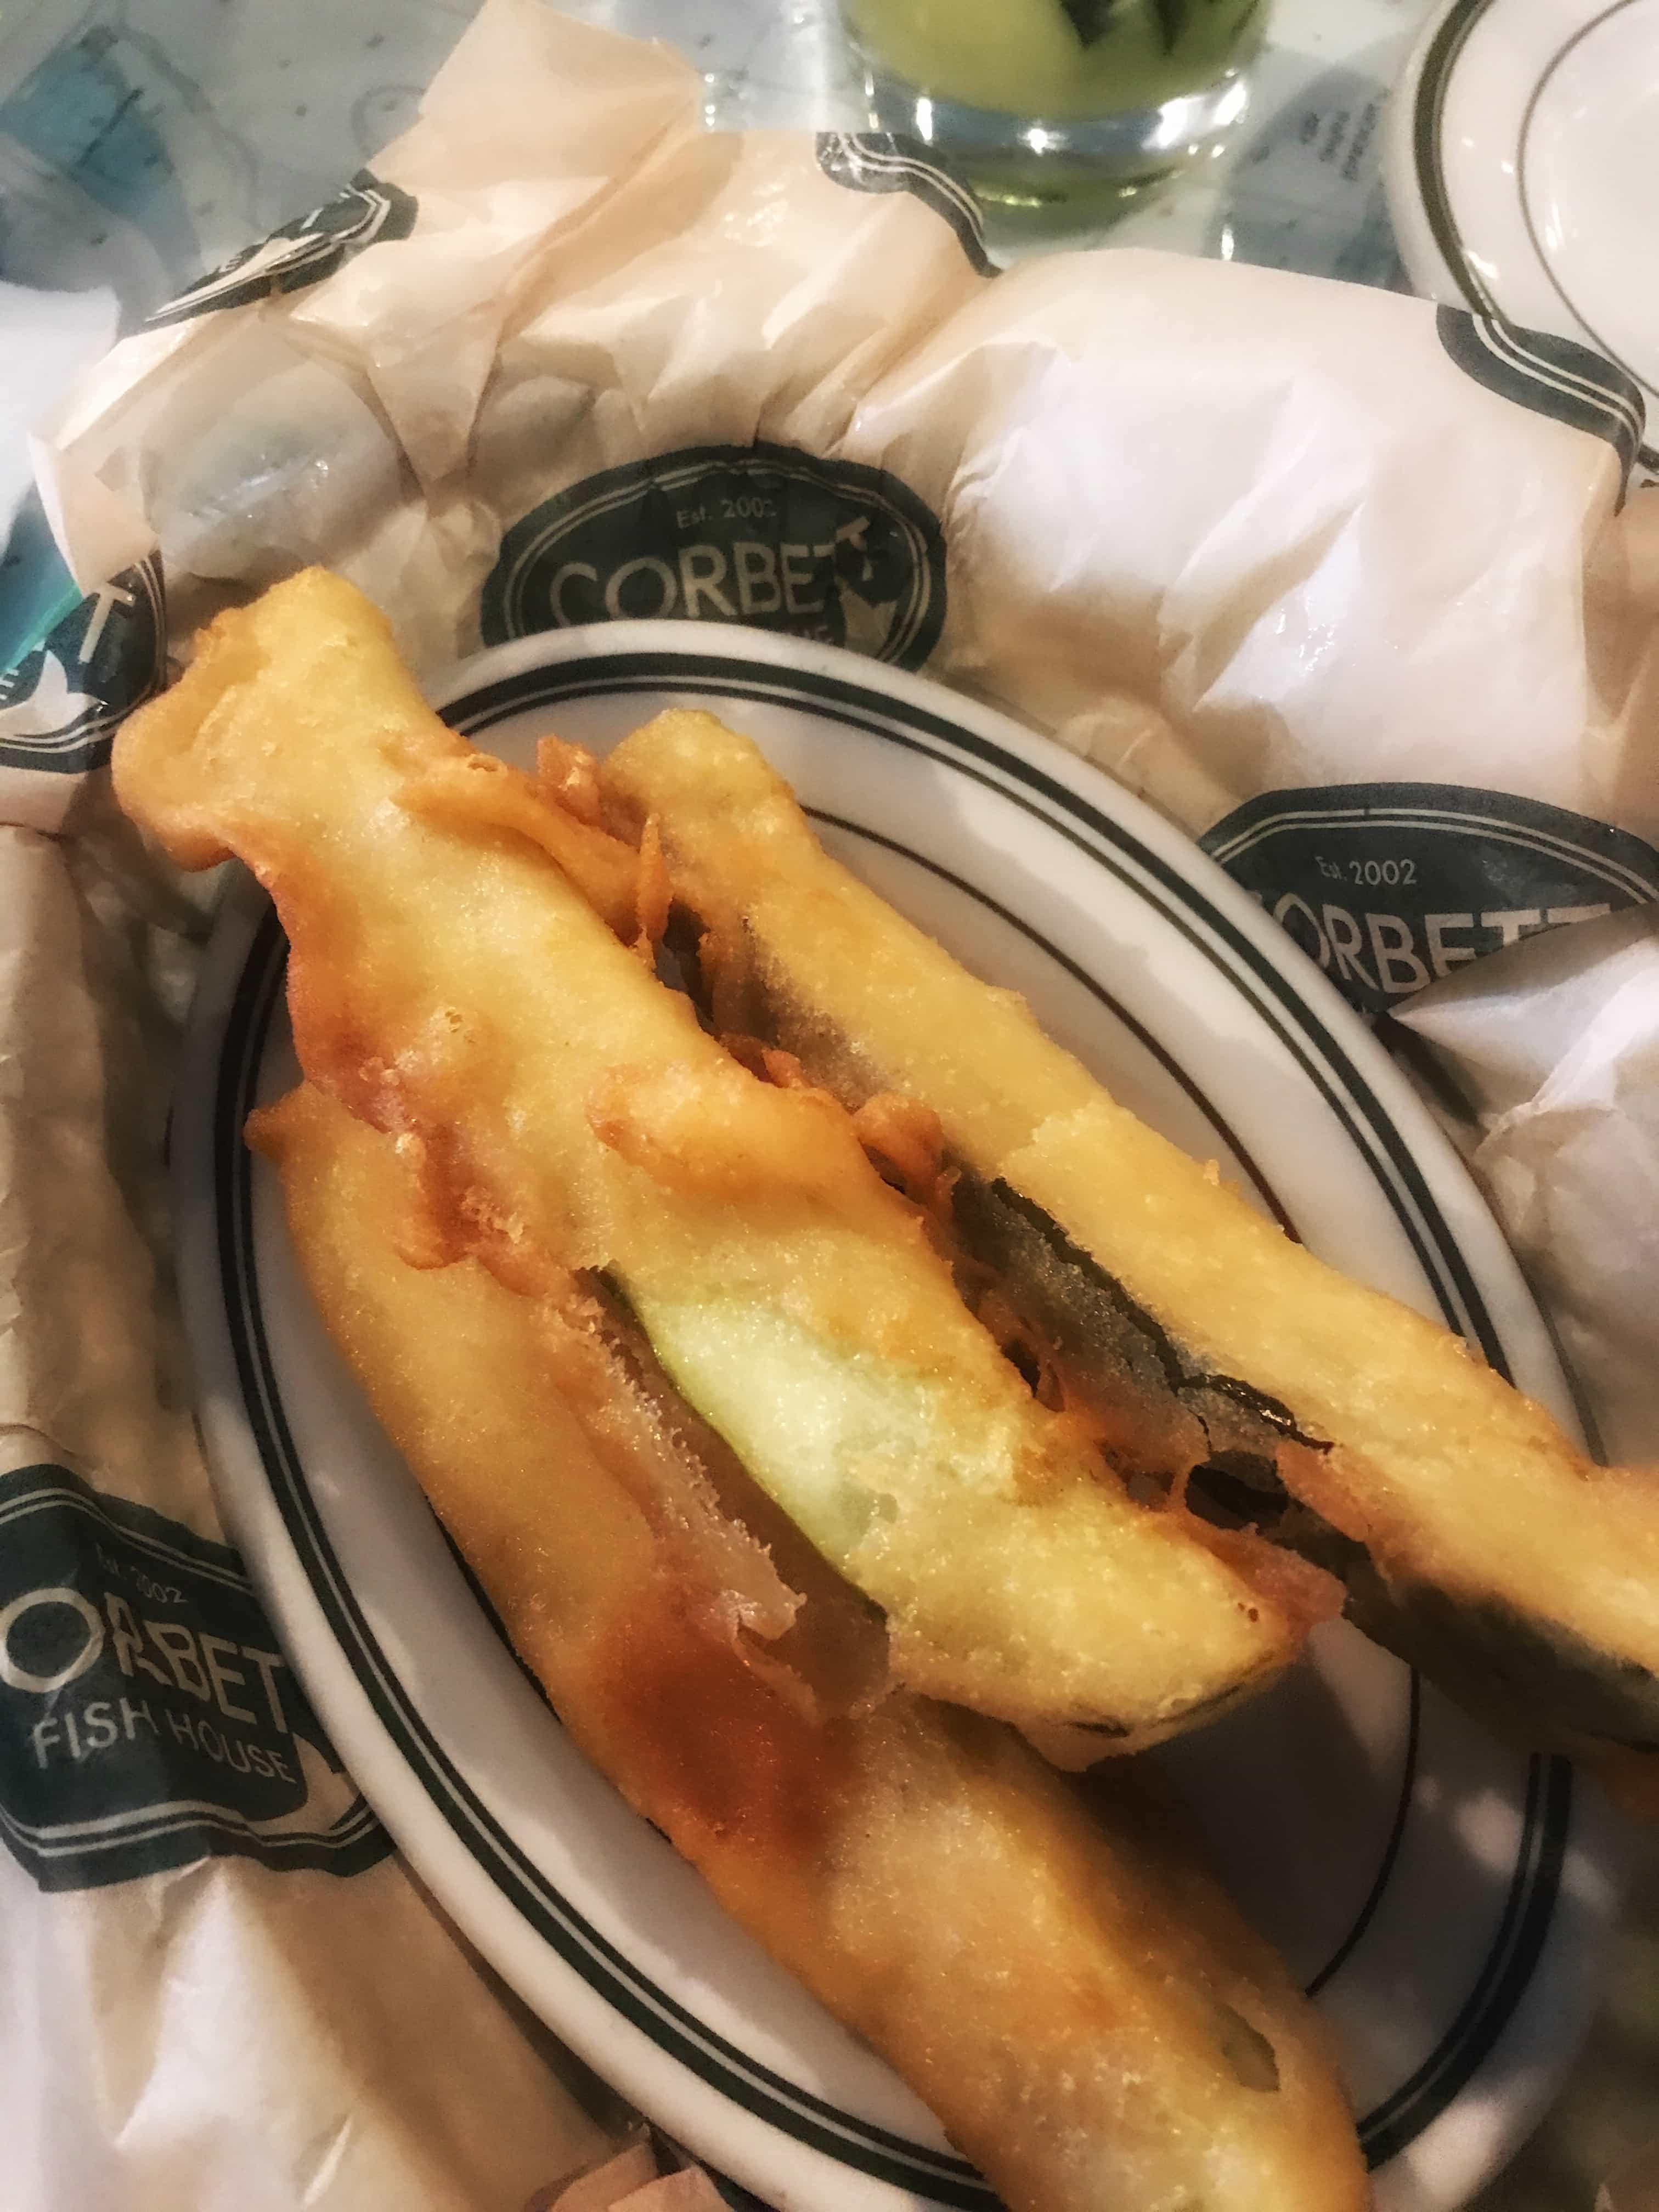 Hawthorne Fish House has vegetarian options in Portland OR 100% gluten free